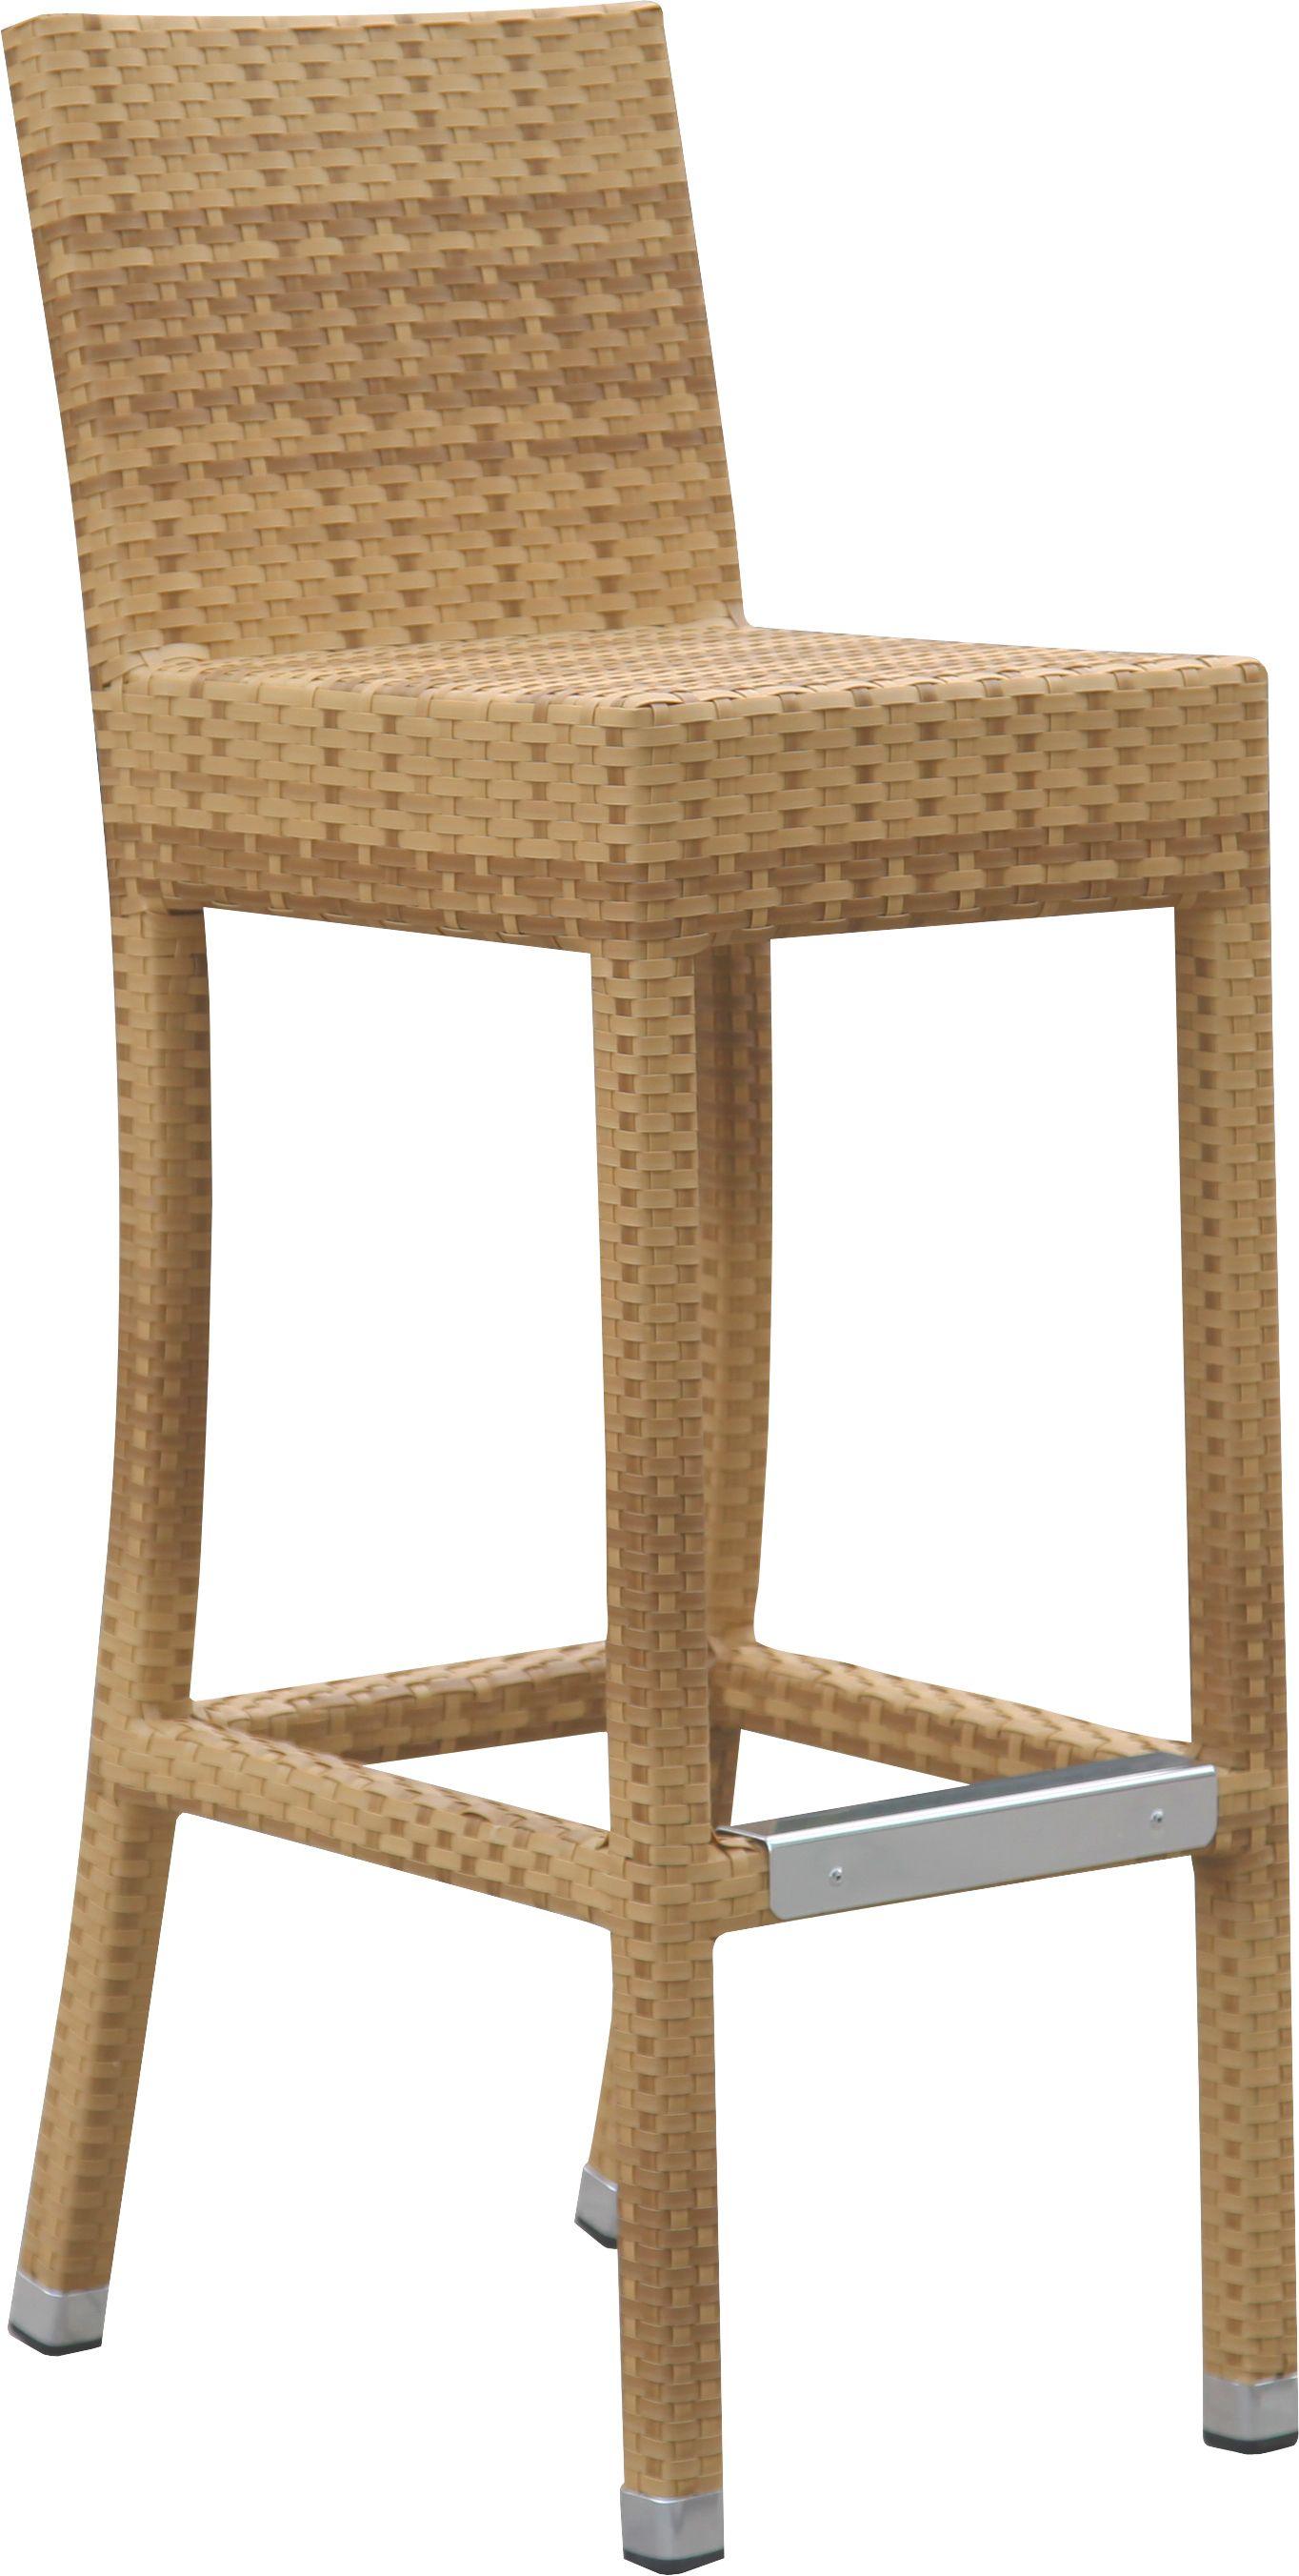 barhocker outdoor dante 100br mit r ckenlehne sereno. Black Bedroom Furniture Sets. Home Design Ideas